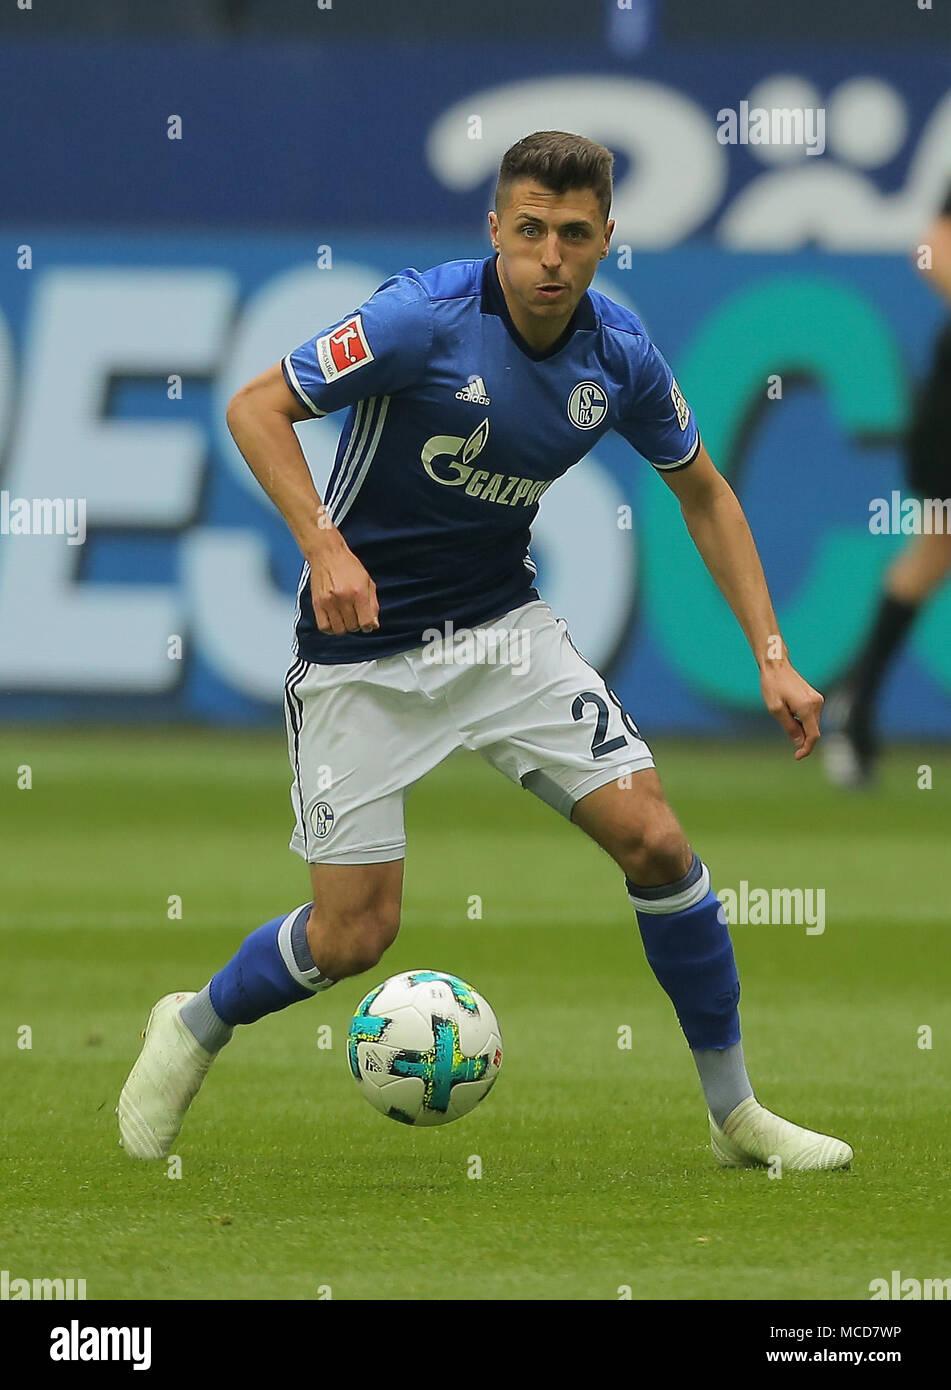 Gelsenkirchen, Germania 15 aprile 2018, Bundesliga giornata 30, FC Schalke 04 vs BV Borussia Dortmund: Alessandro Andre Schoepf (Schalke) in azione. Credito: Juergen schwarz/Alamy Live News Foto Stock